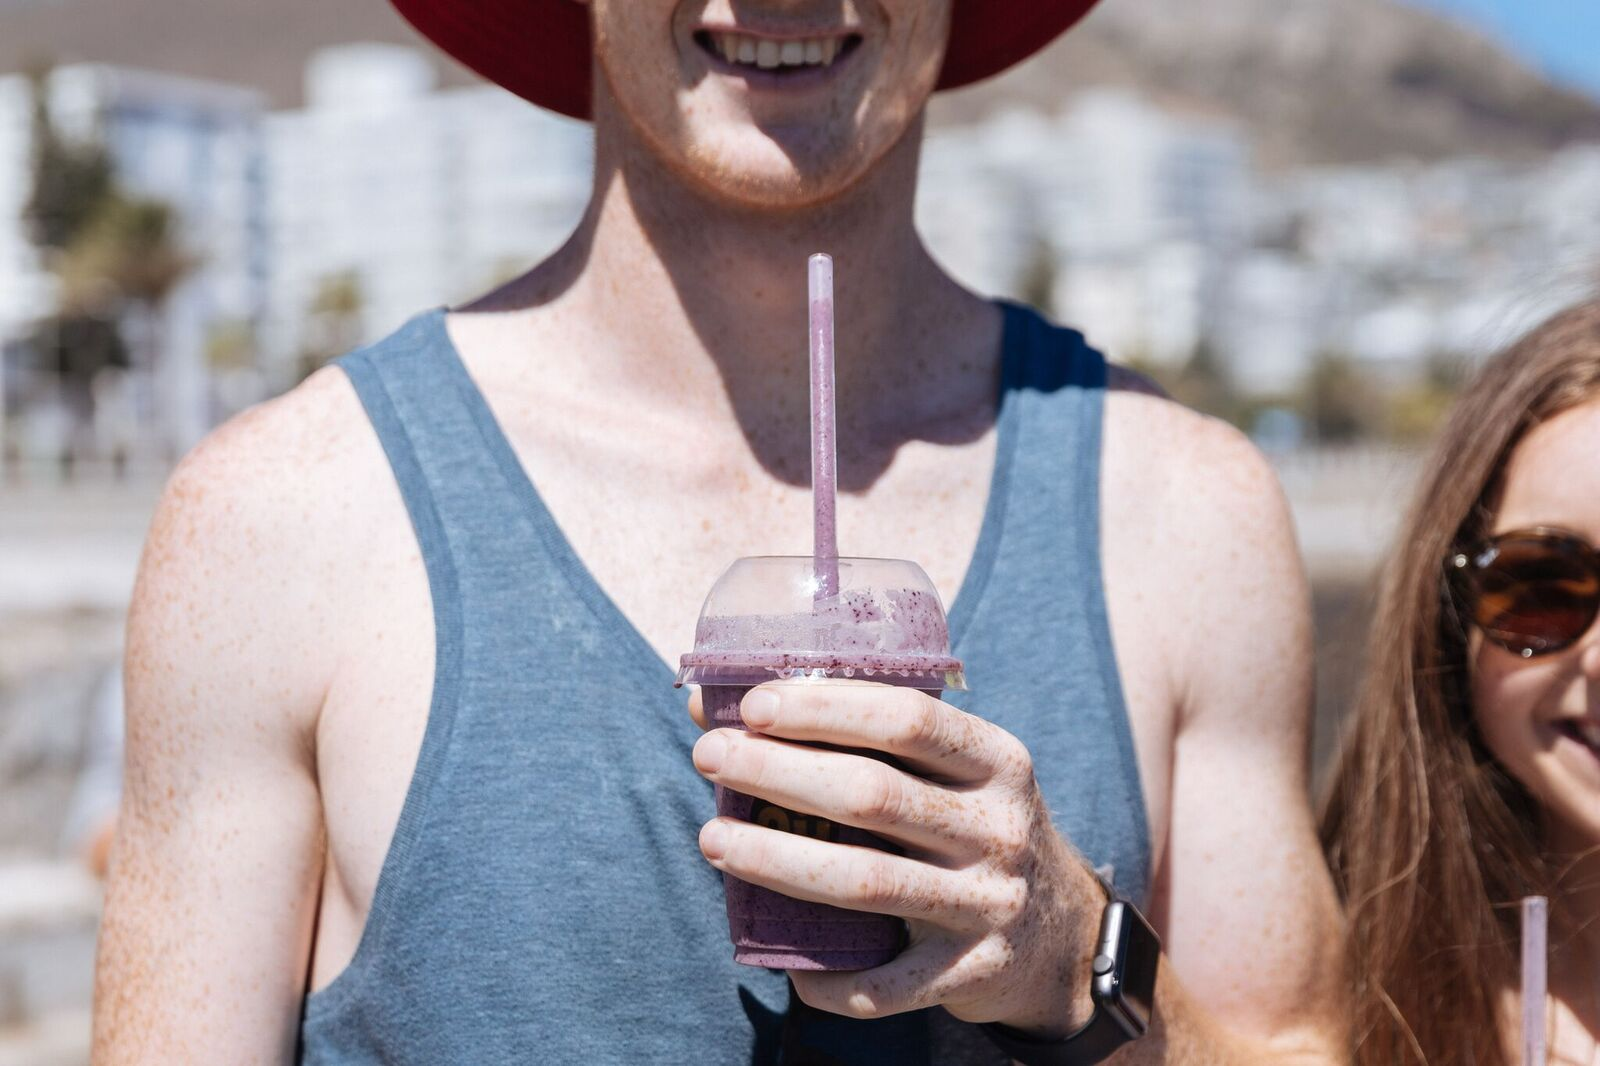 suck it straws eco-cups eco-straws